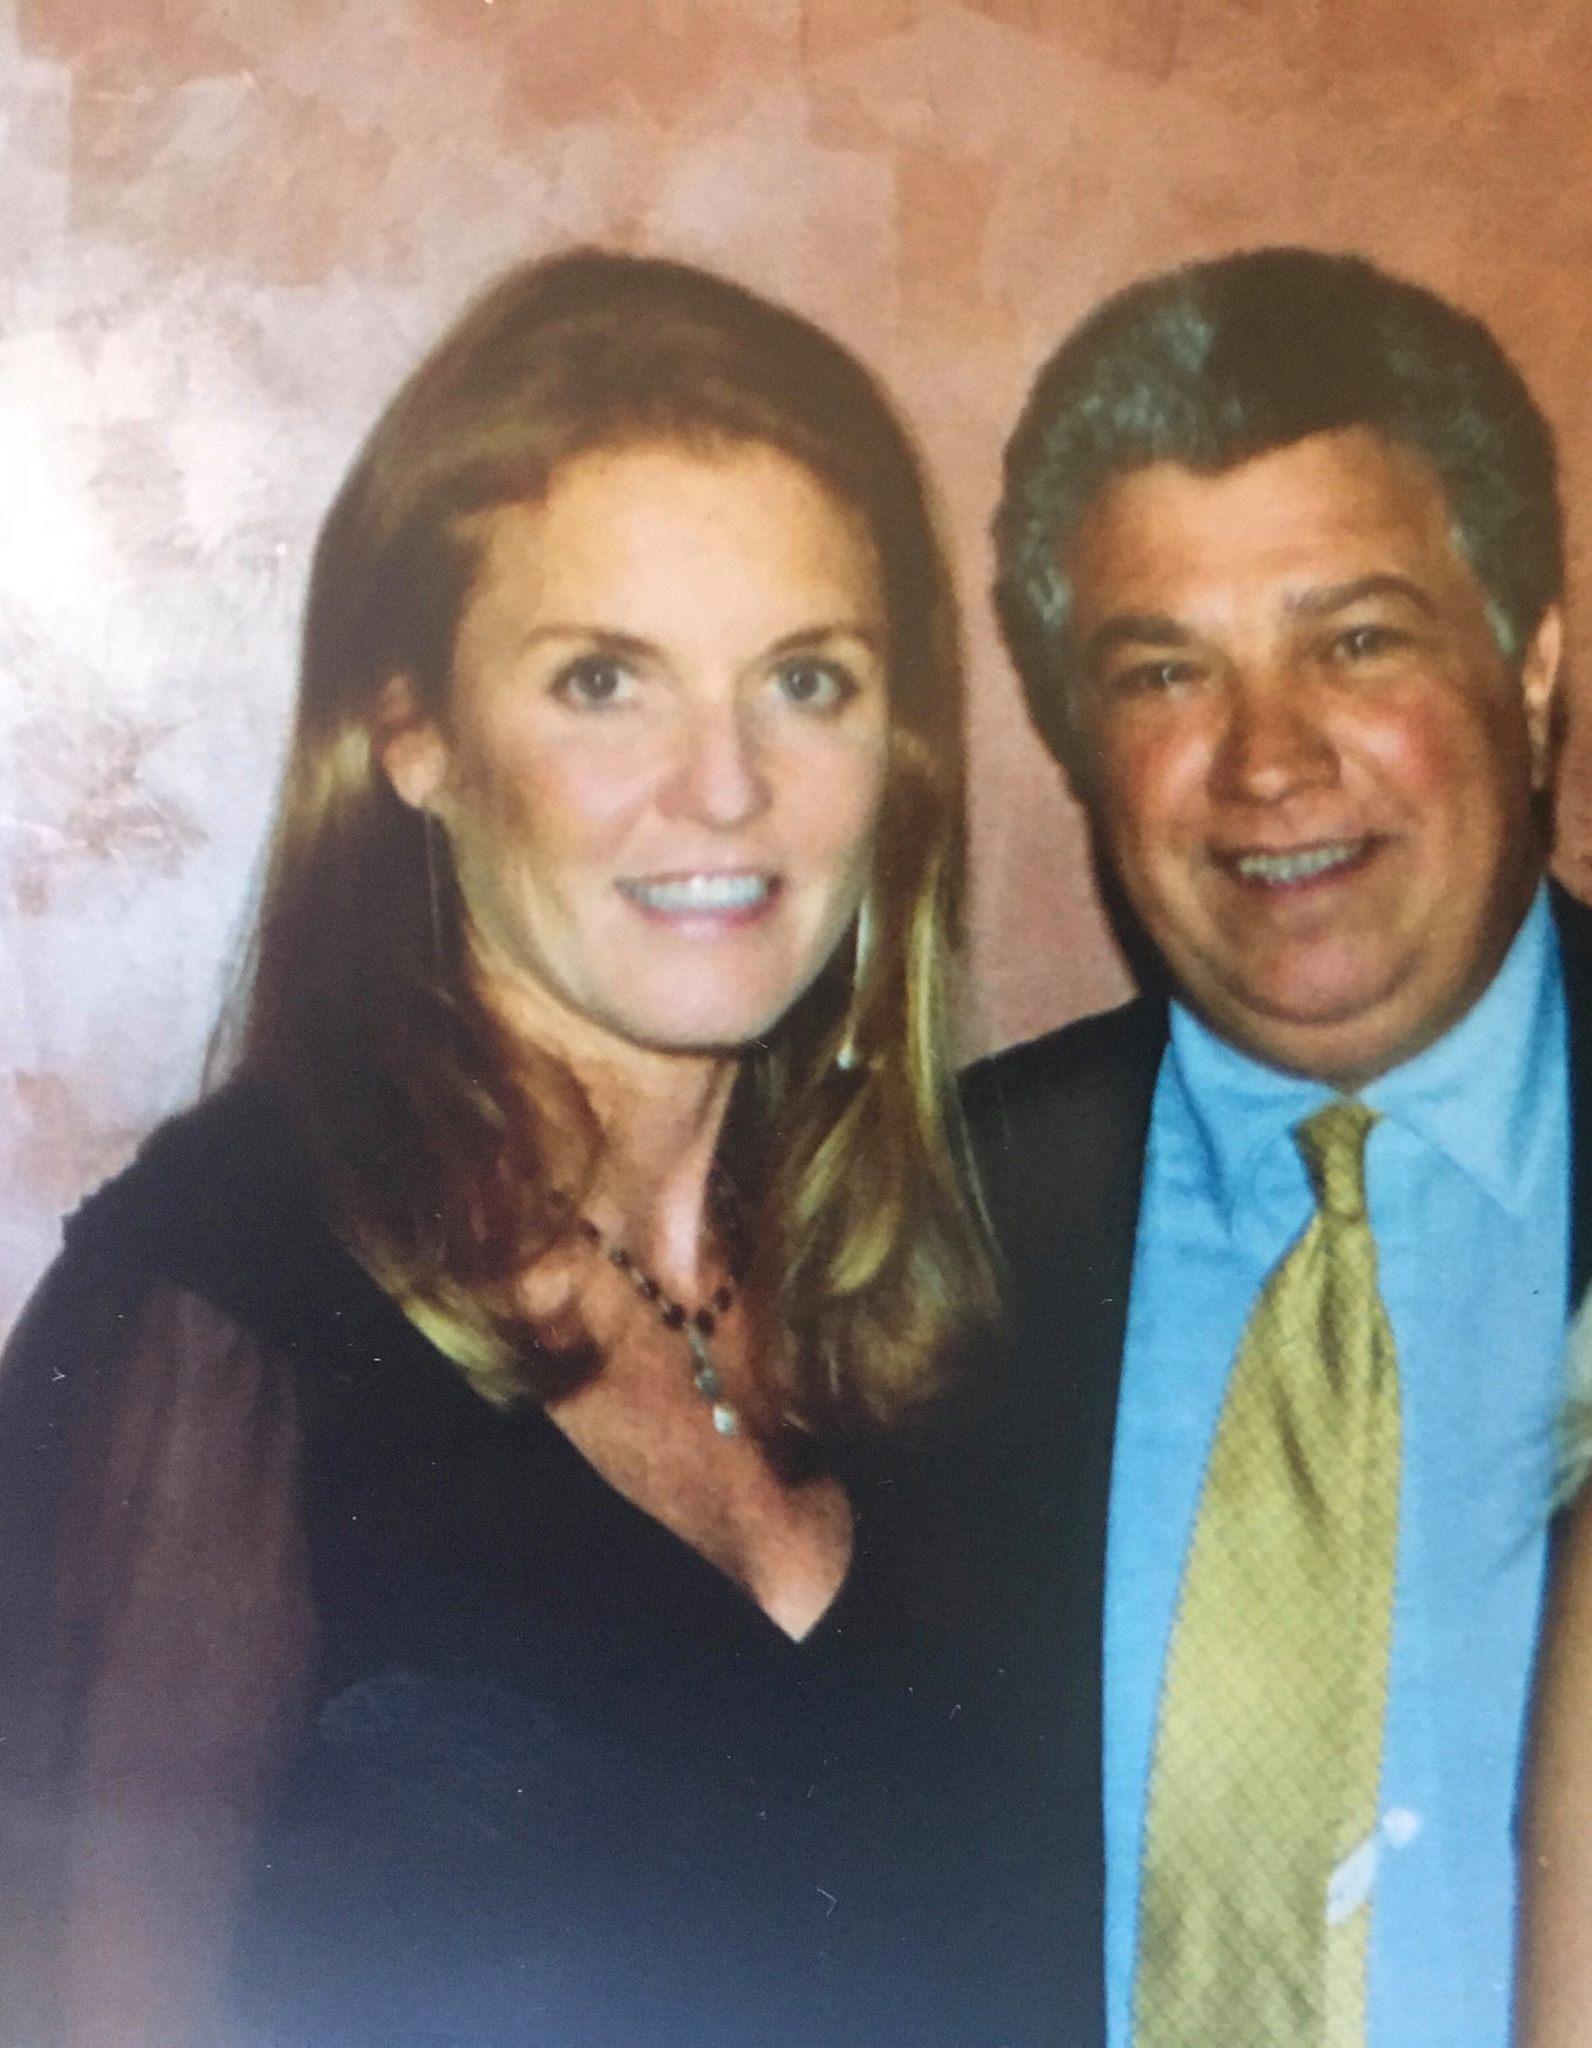 Michel Bittan and the Duchess